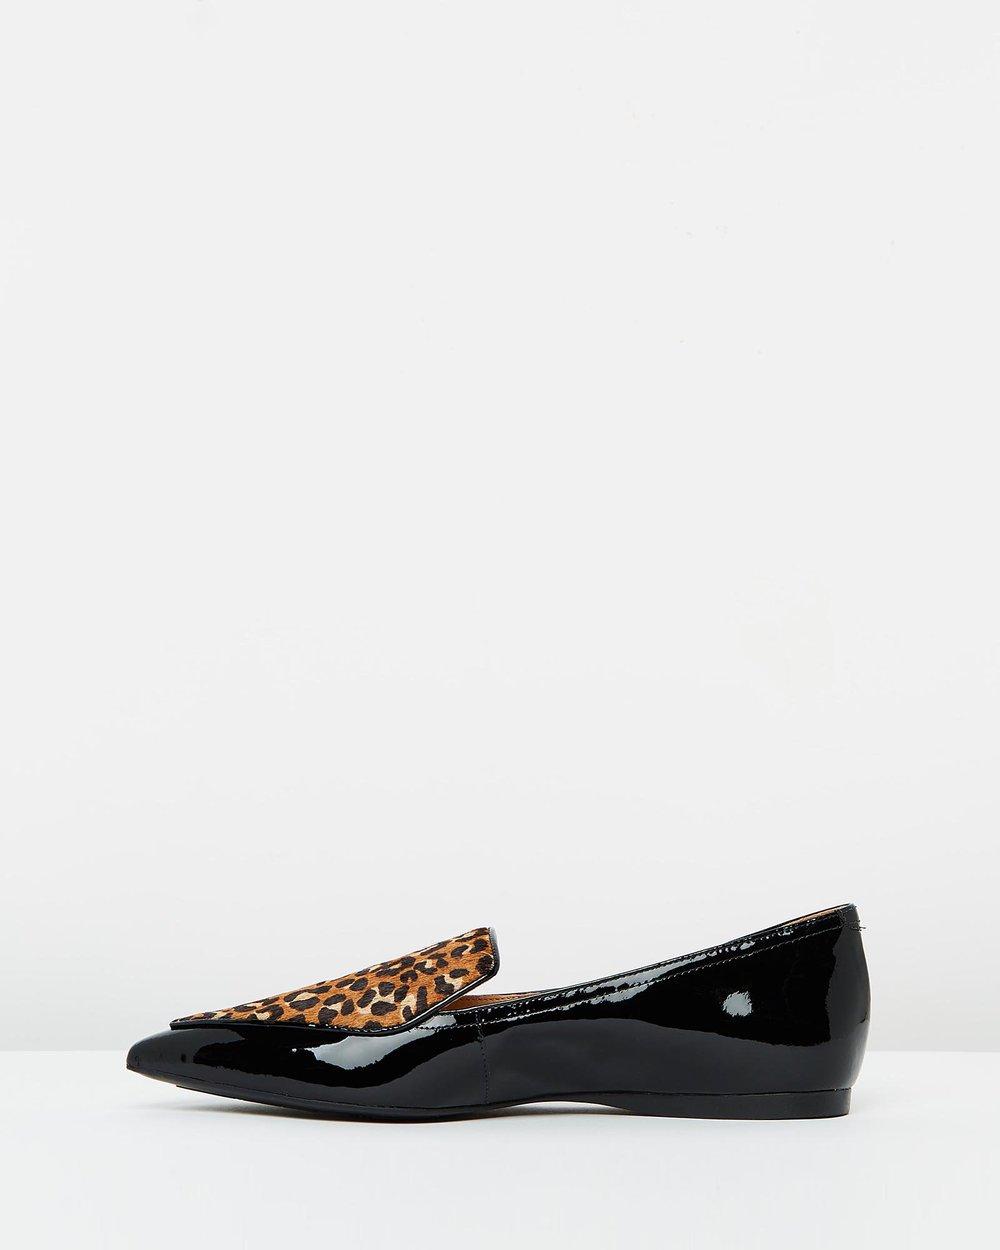 Candy - Black & Leopard